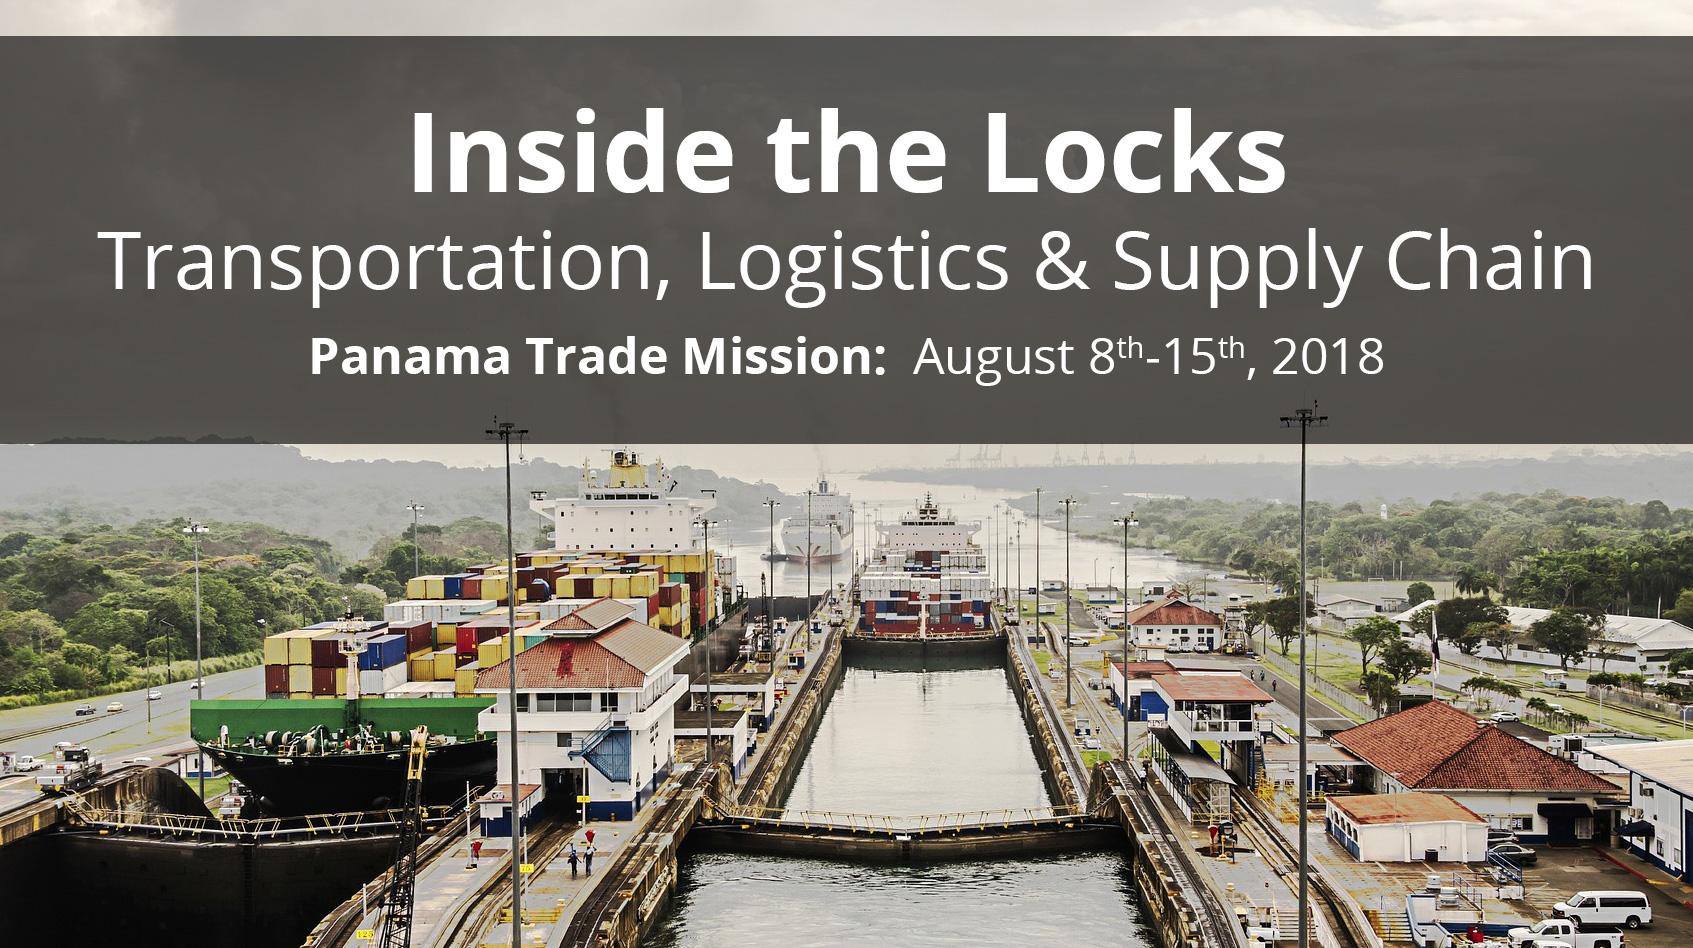 panama trade mission 2018